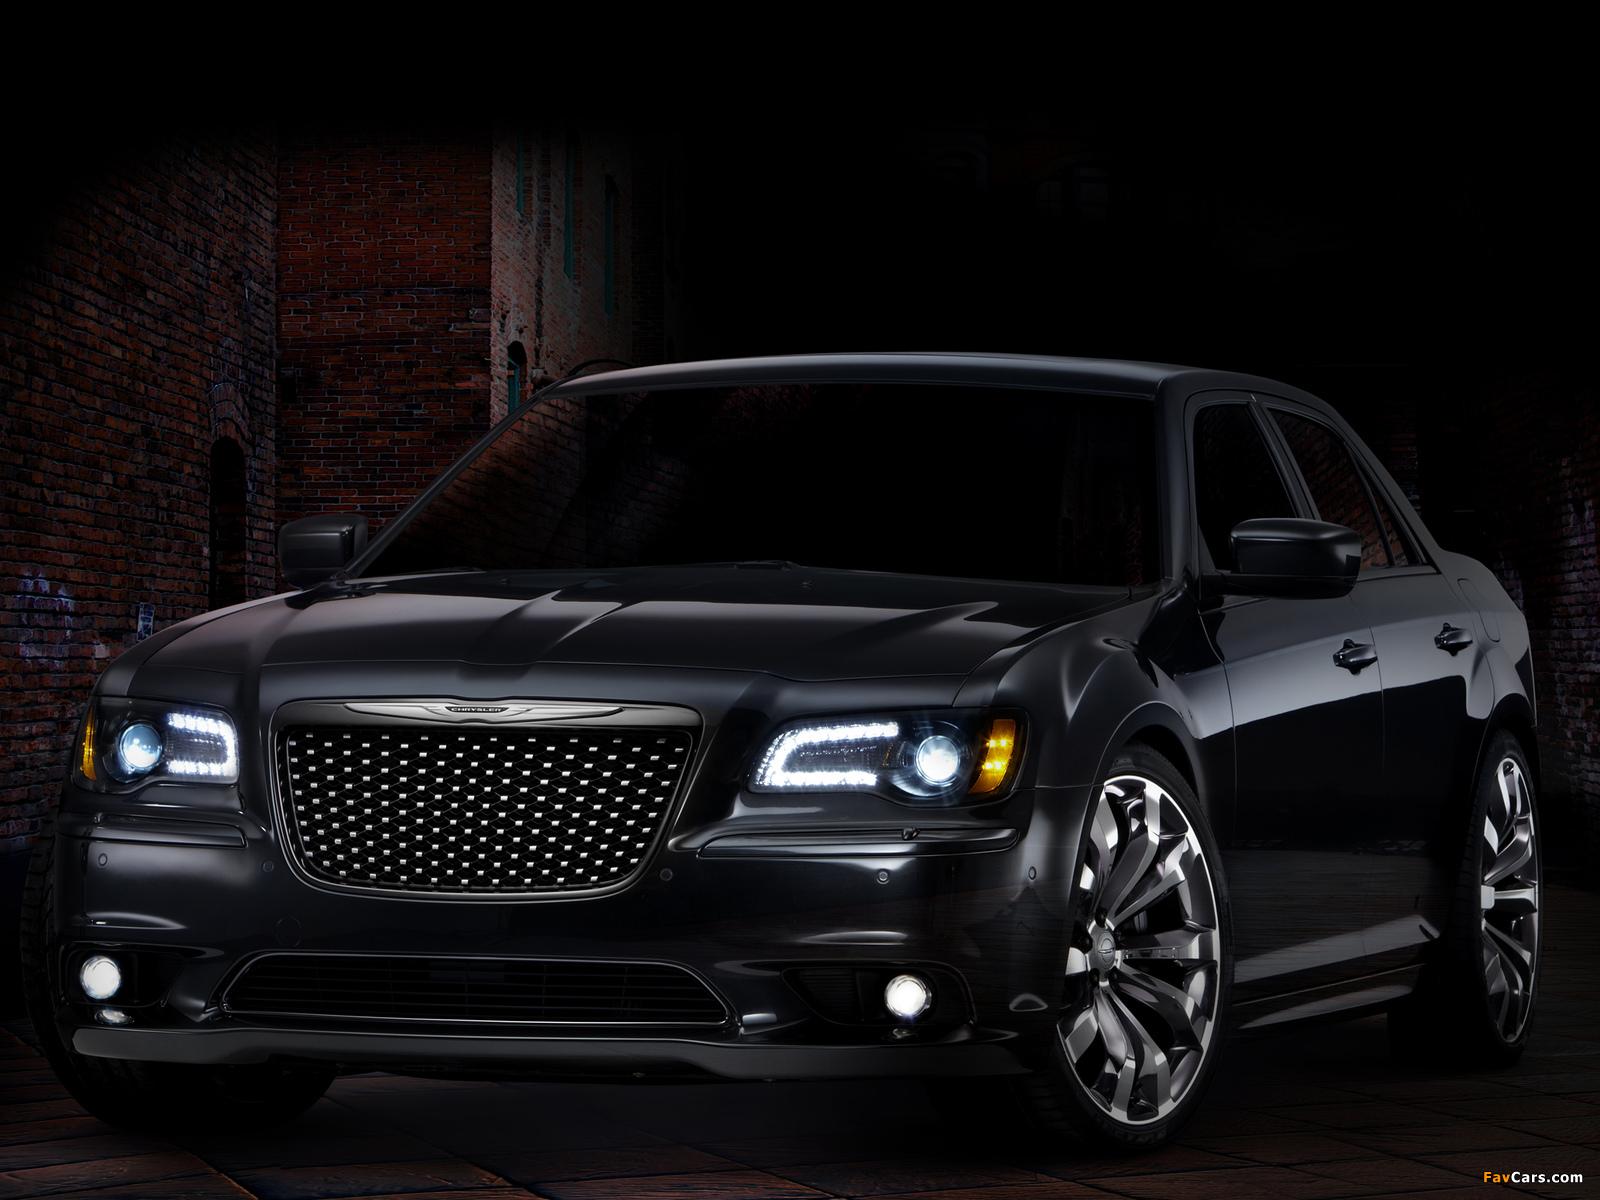 Chrysler 300 Ruyi Design Concept 2012 wallpapers (1600 x 1200)